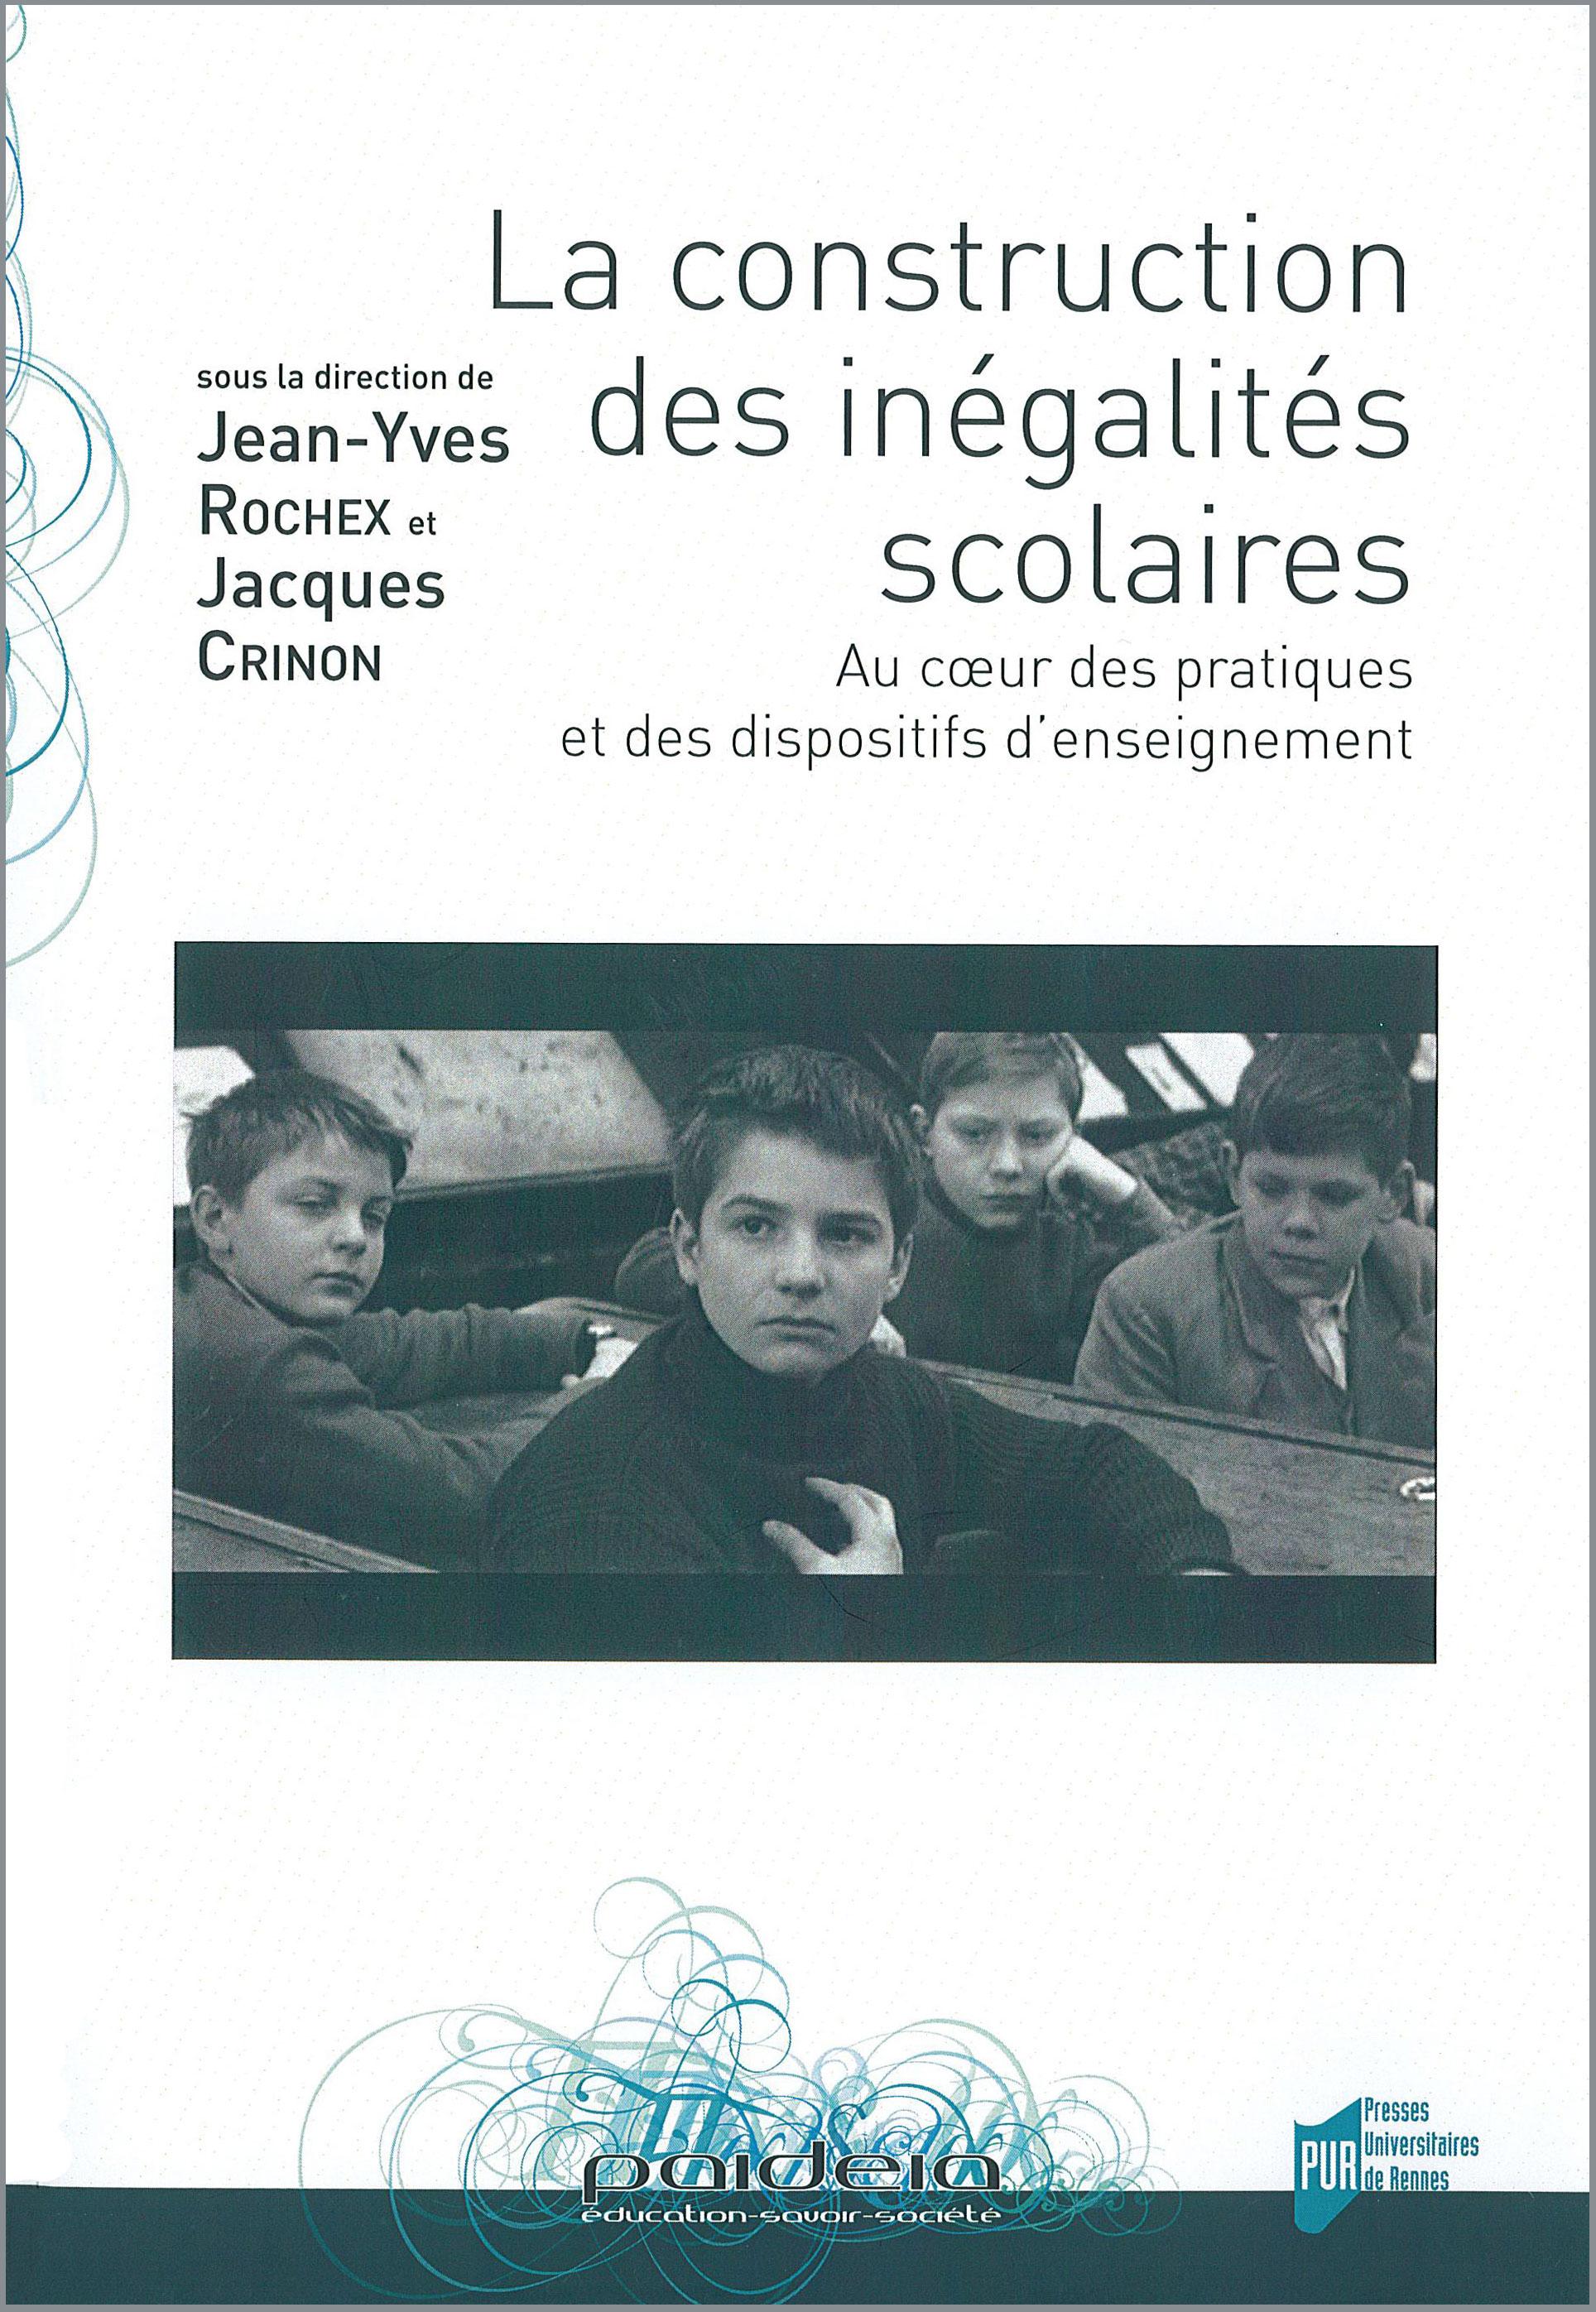 2012-01-23-Construction_inegalites_scolairescopie.jpg